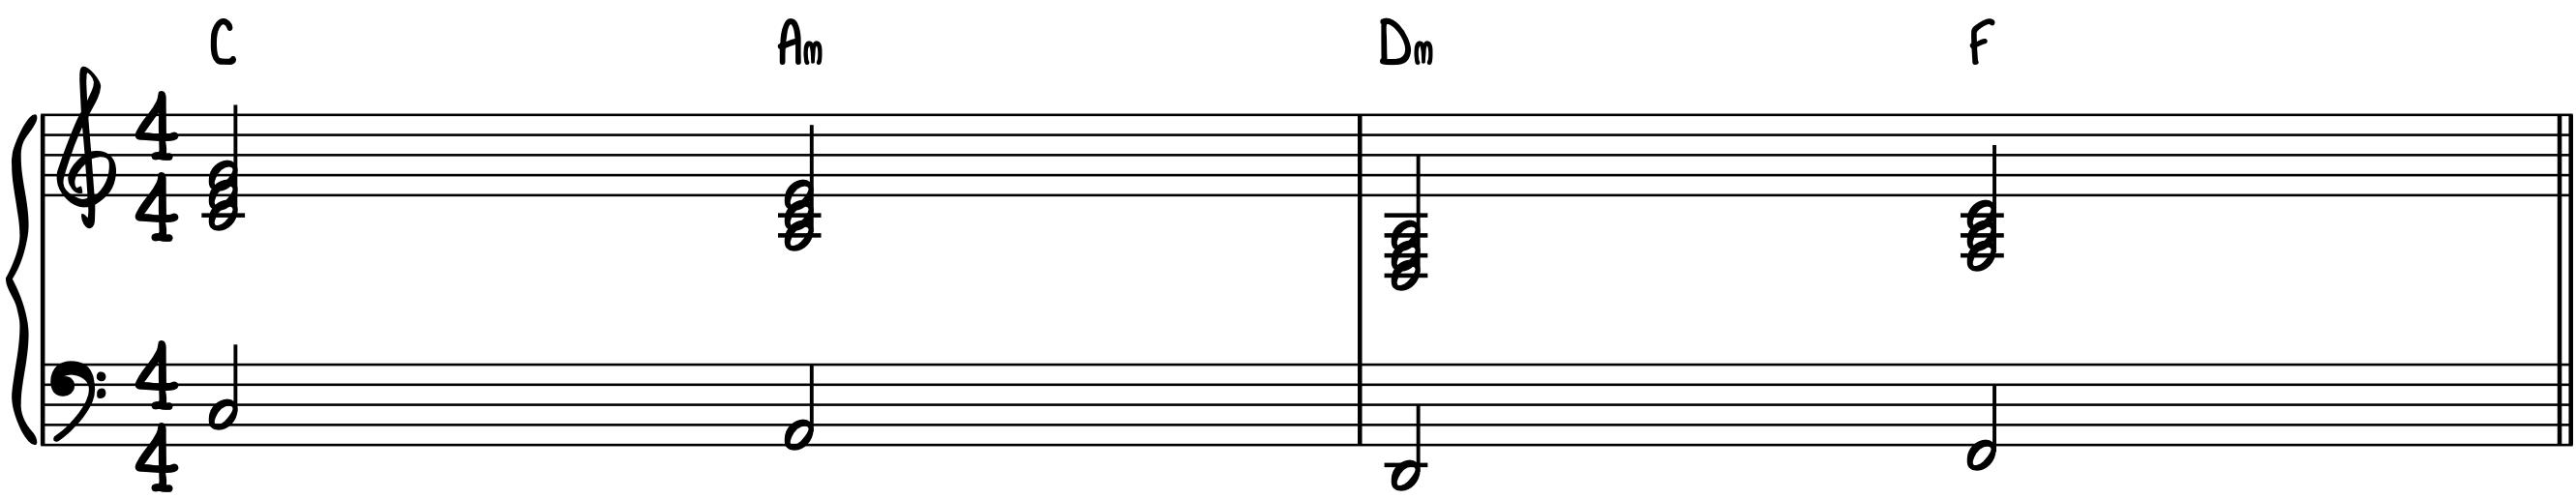 Standard Chord Progression in C Major Using Major & Minor Triads